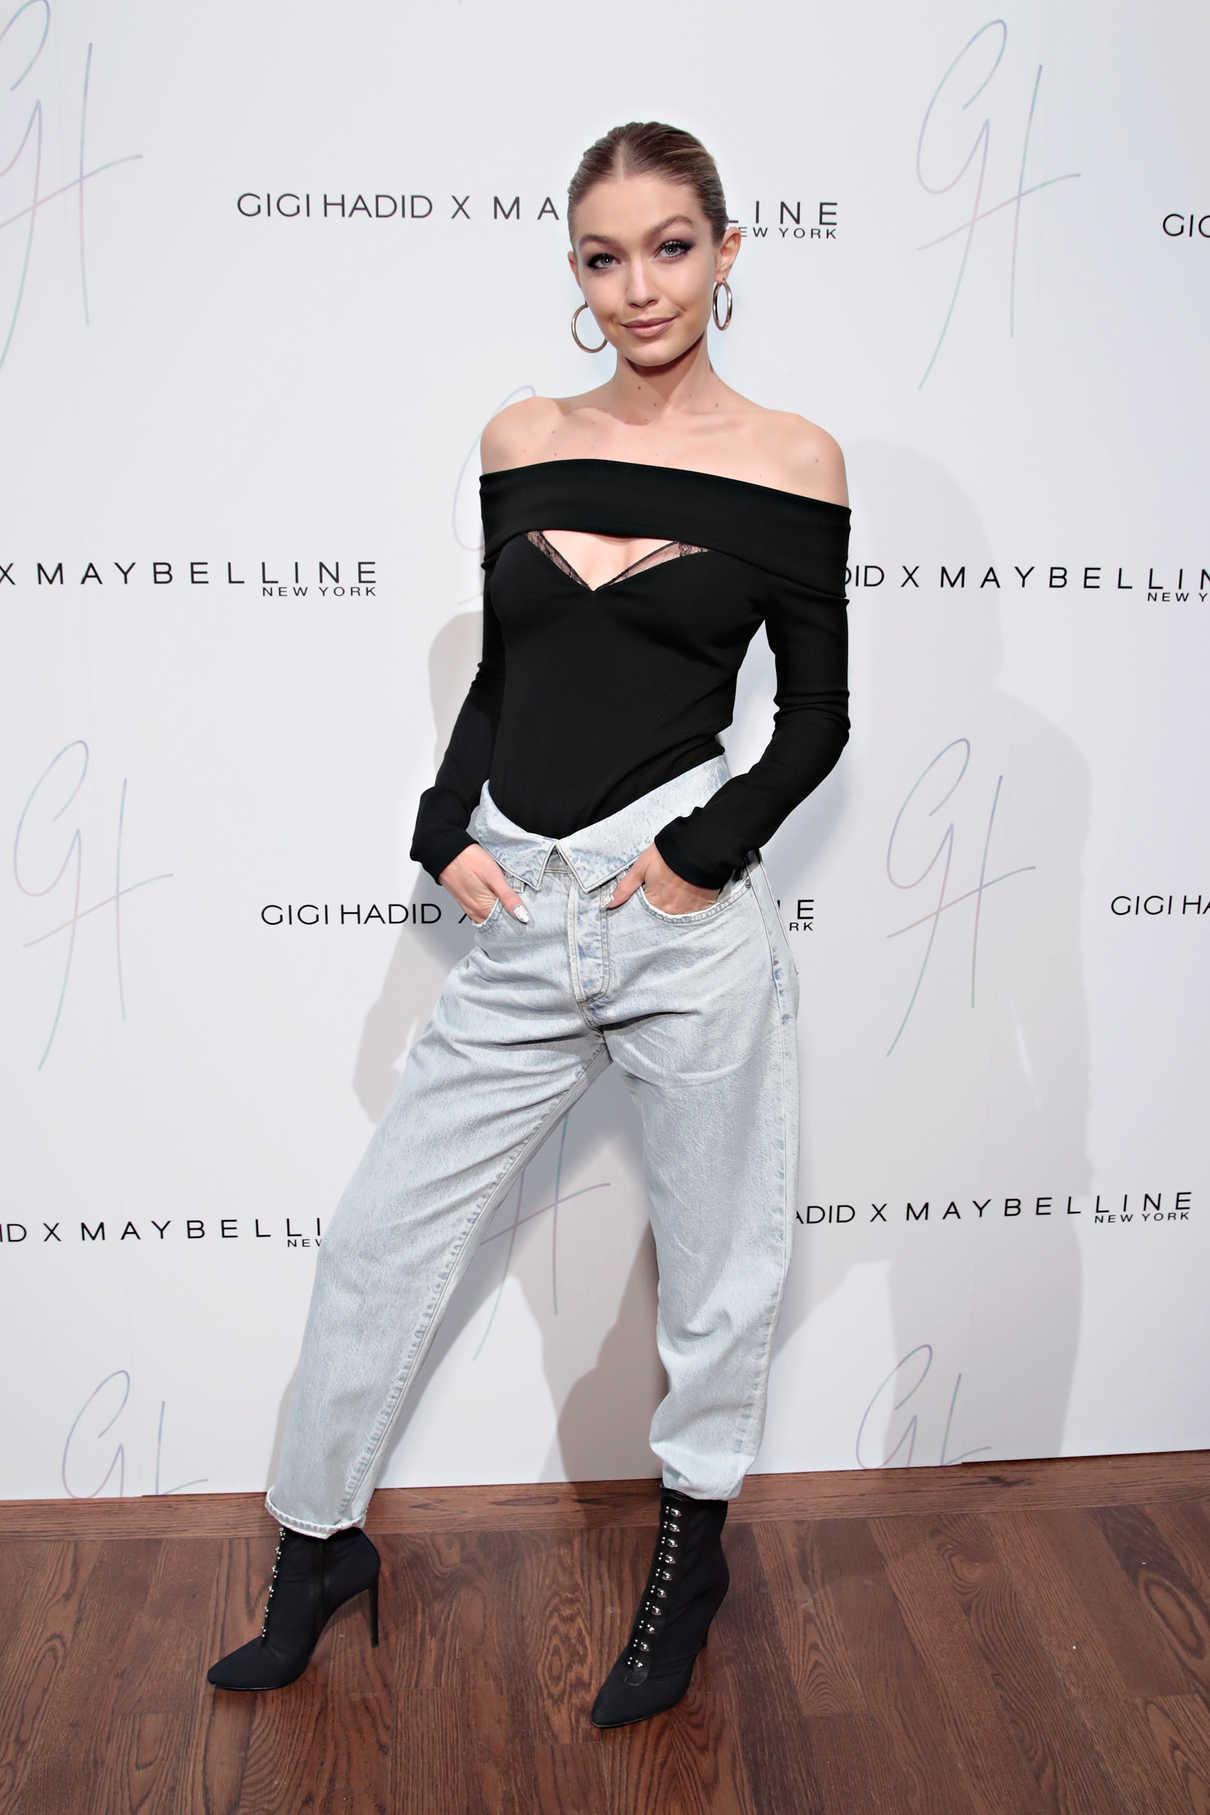 Gigi Hadid Attends the Gigi Hadid x Maybelline New York International Launch Party in NYC 11/03/2017-3